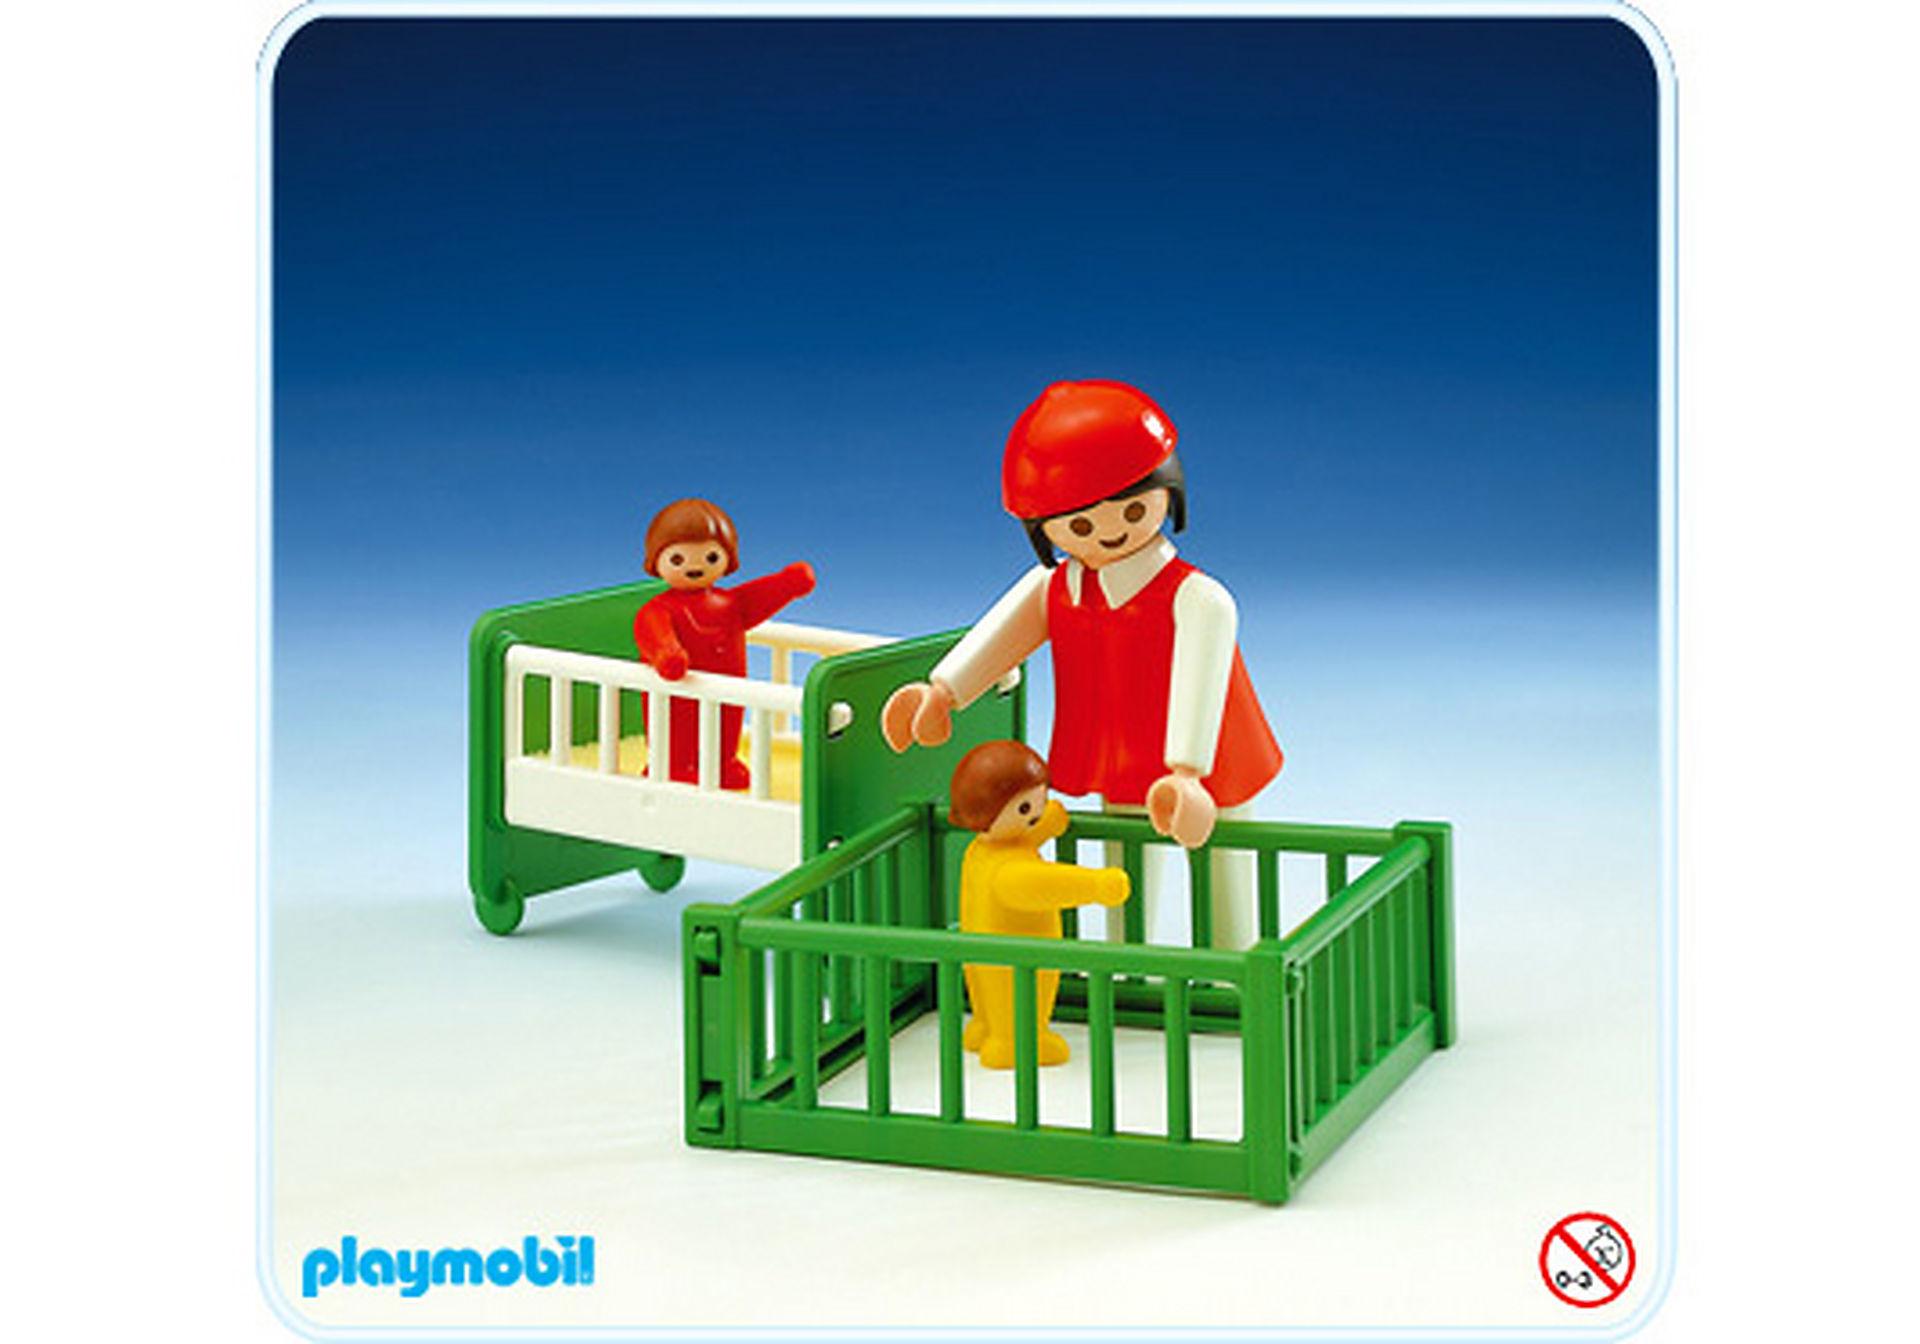 http://media.playmobil.com/i/playmobil/3593-A_product_detail/Mutter/2Babies/Laufstall/Bett